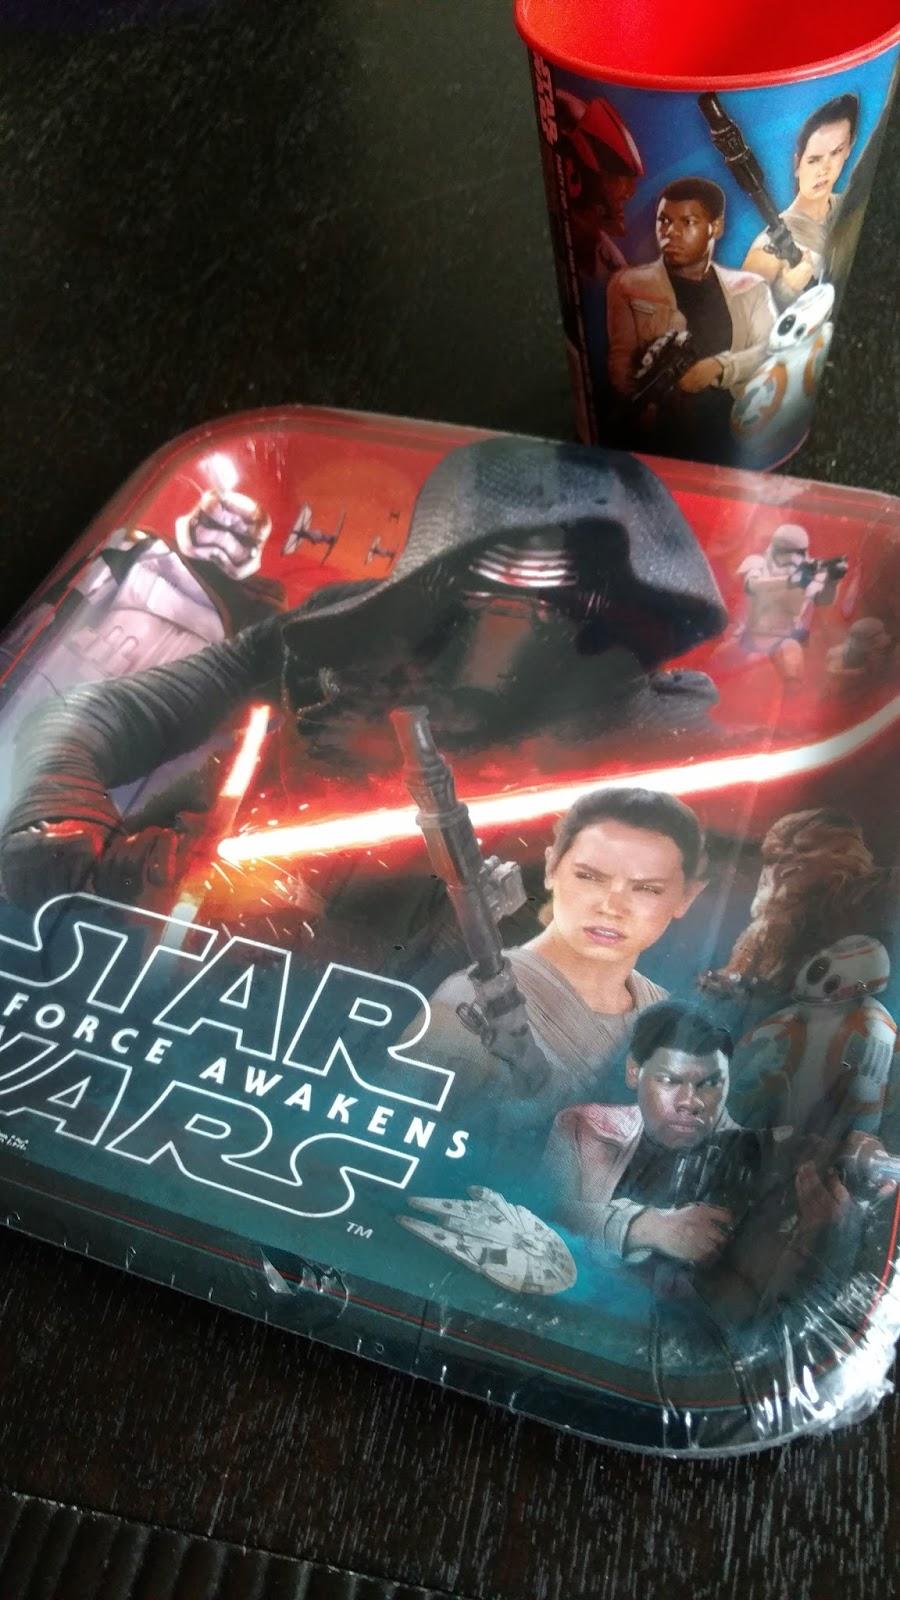 Star Wars The Force Awakens Dvd Exclusive To Walmart